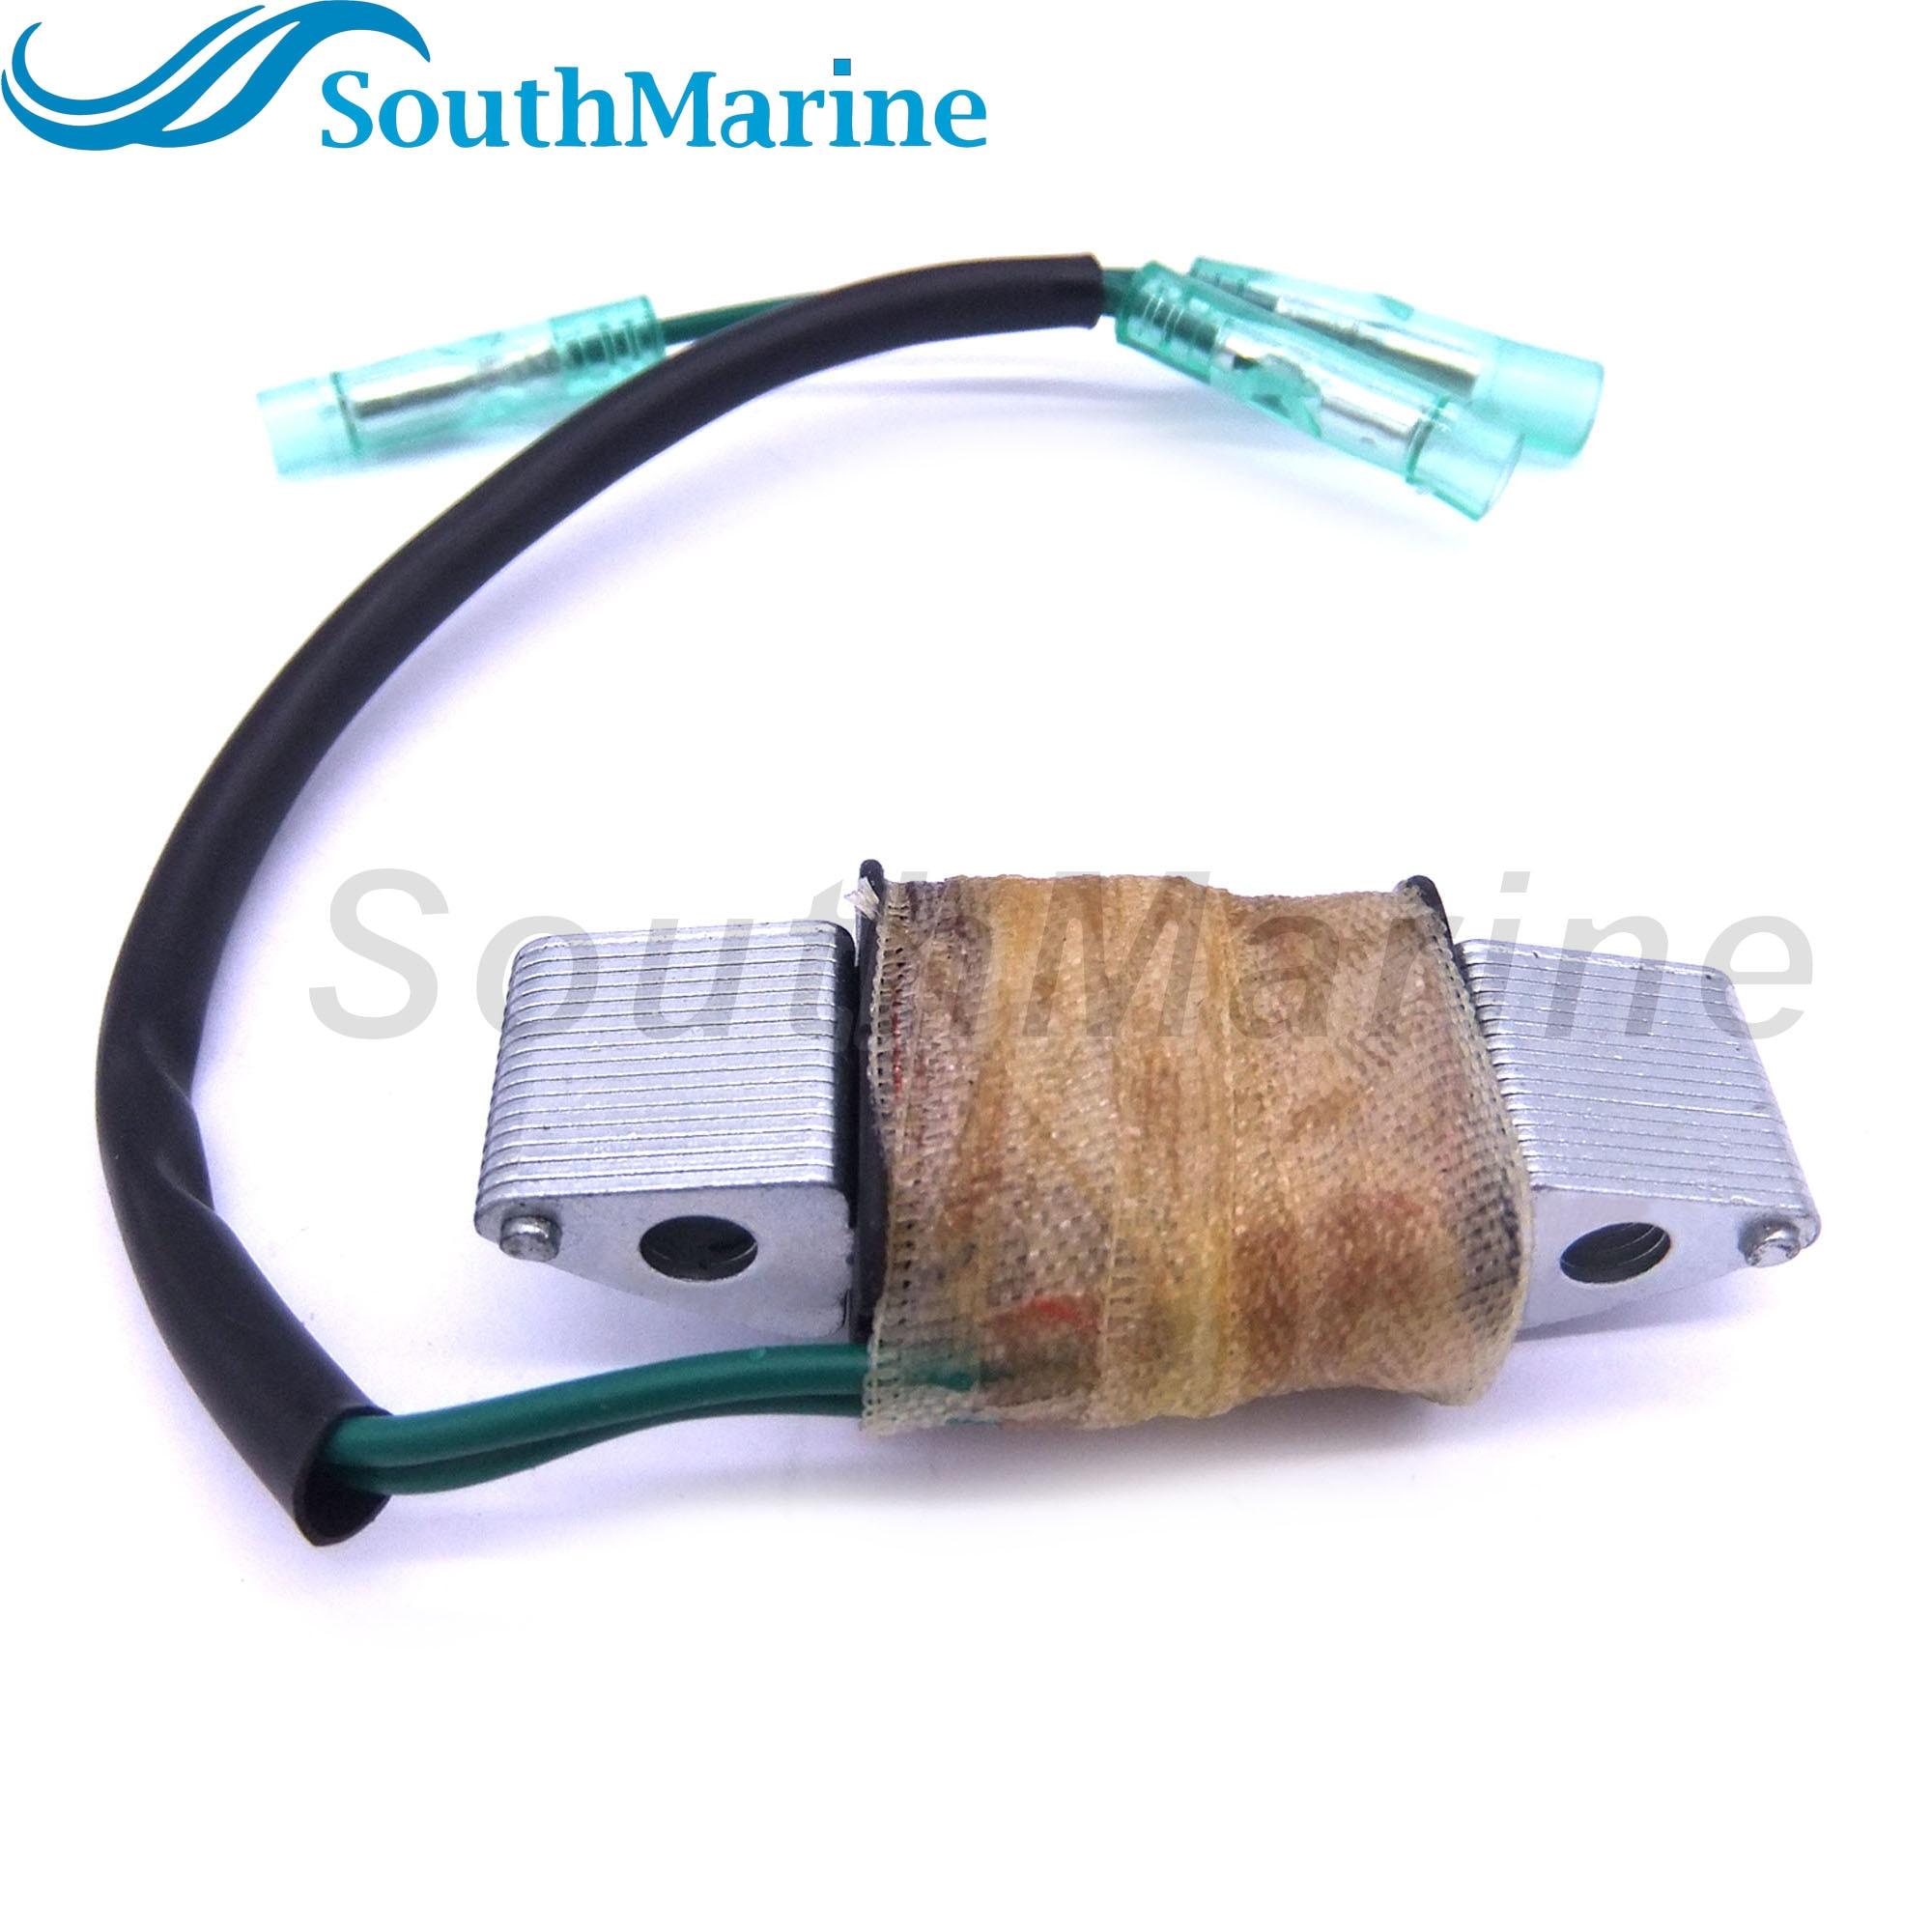 MERCURY MARINER STARTER SOLENOID RELAY FITS 4 STROKE 60HP 75HP 90HP  89-825096T